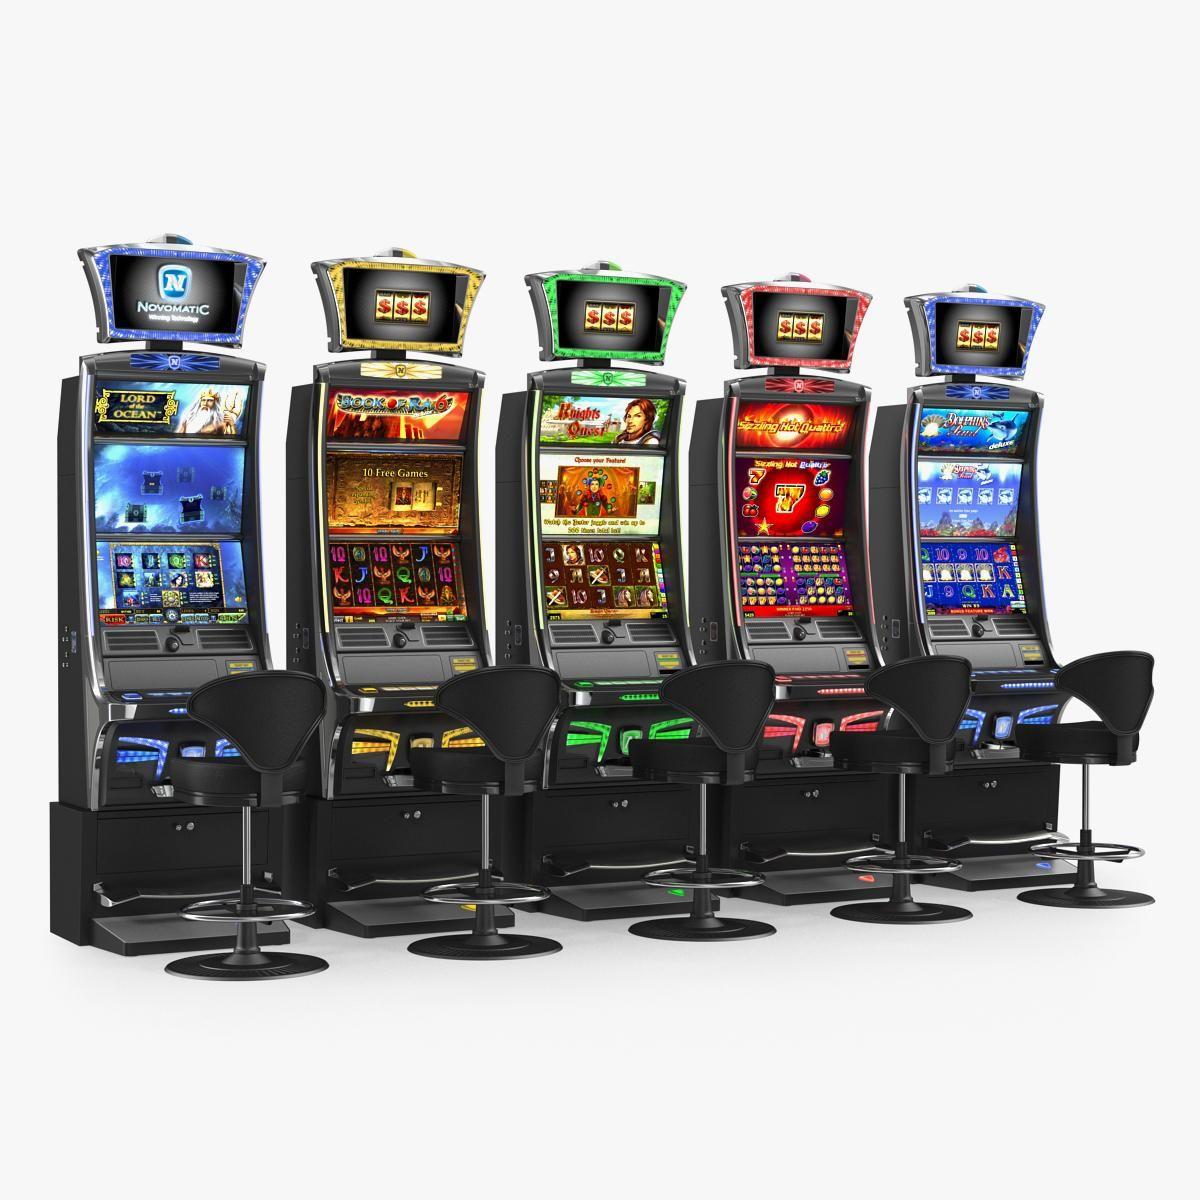 Slot Machine Models And Sizes